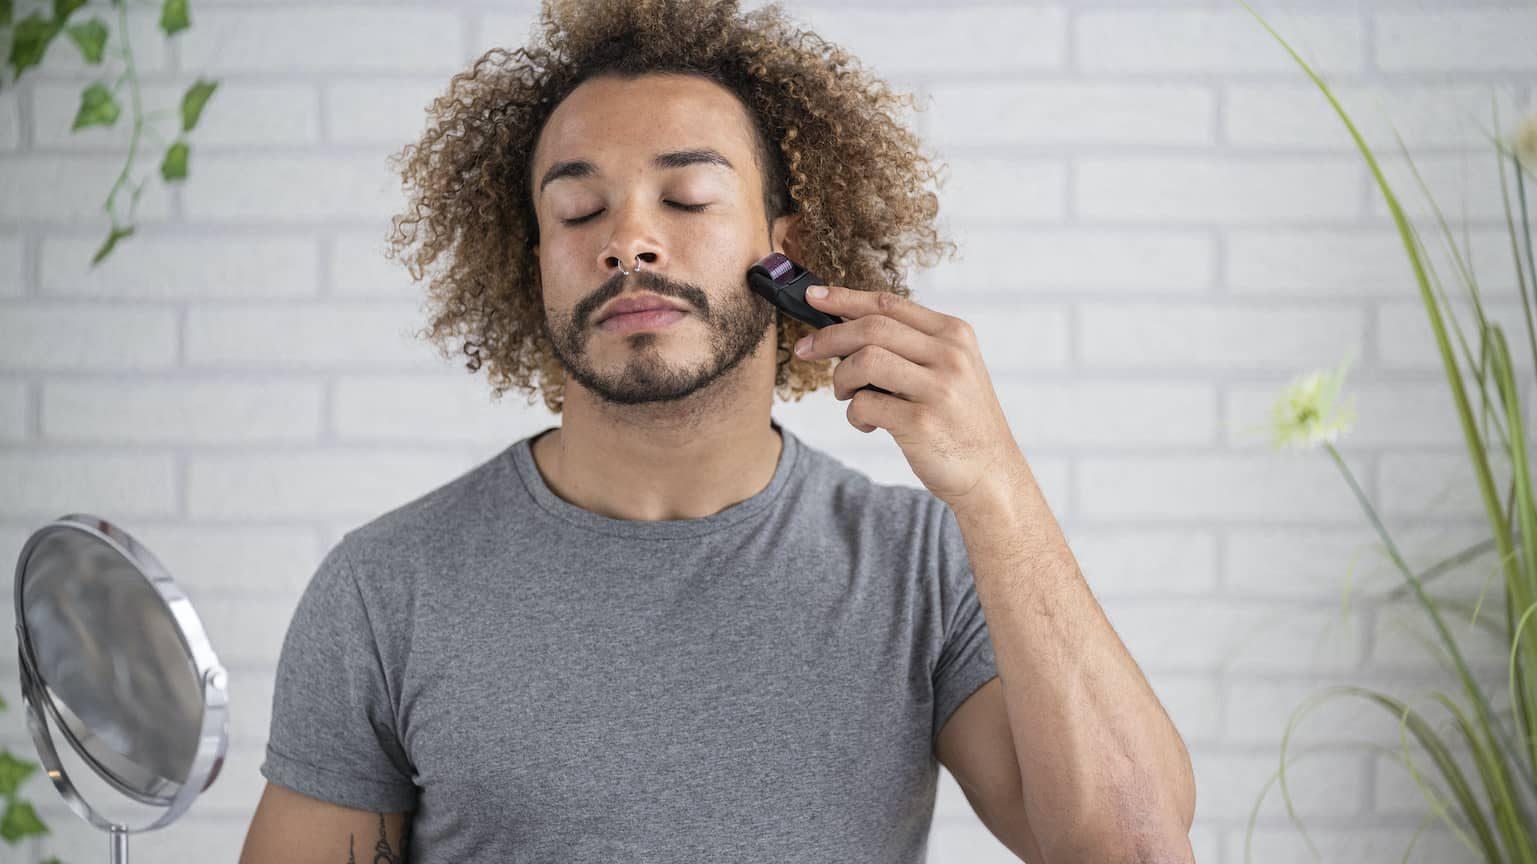 Man using a derma roller in the mirror